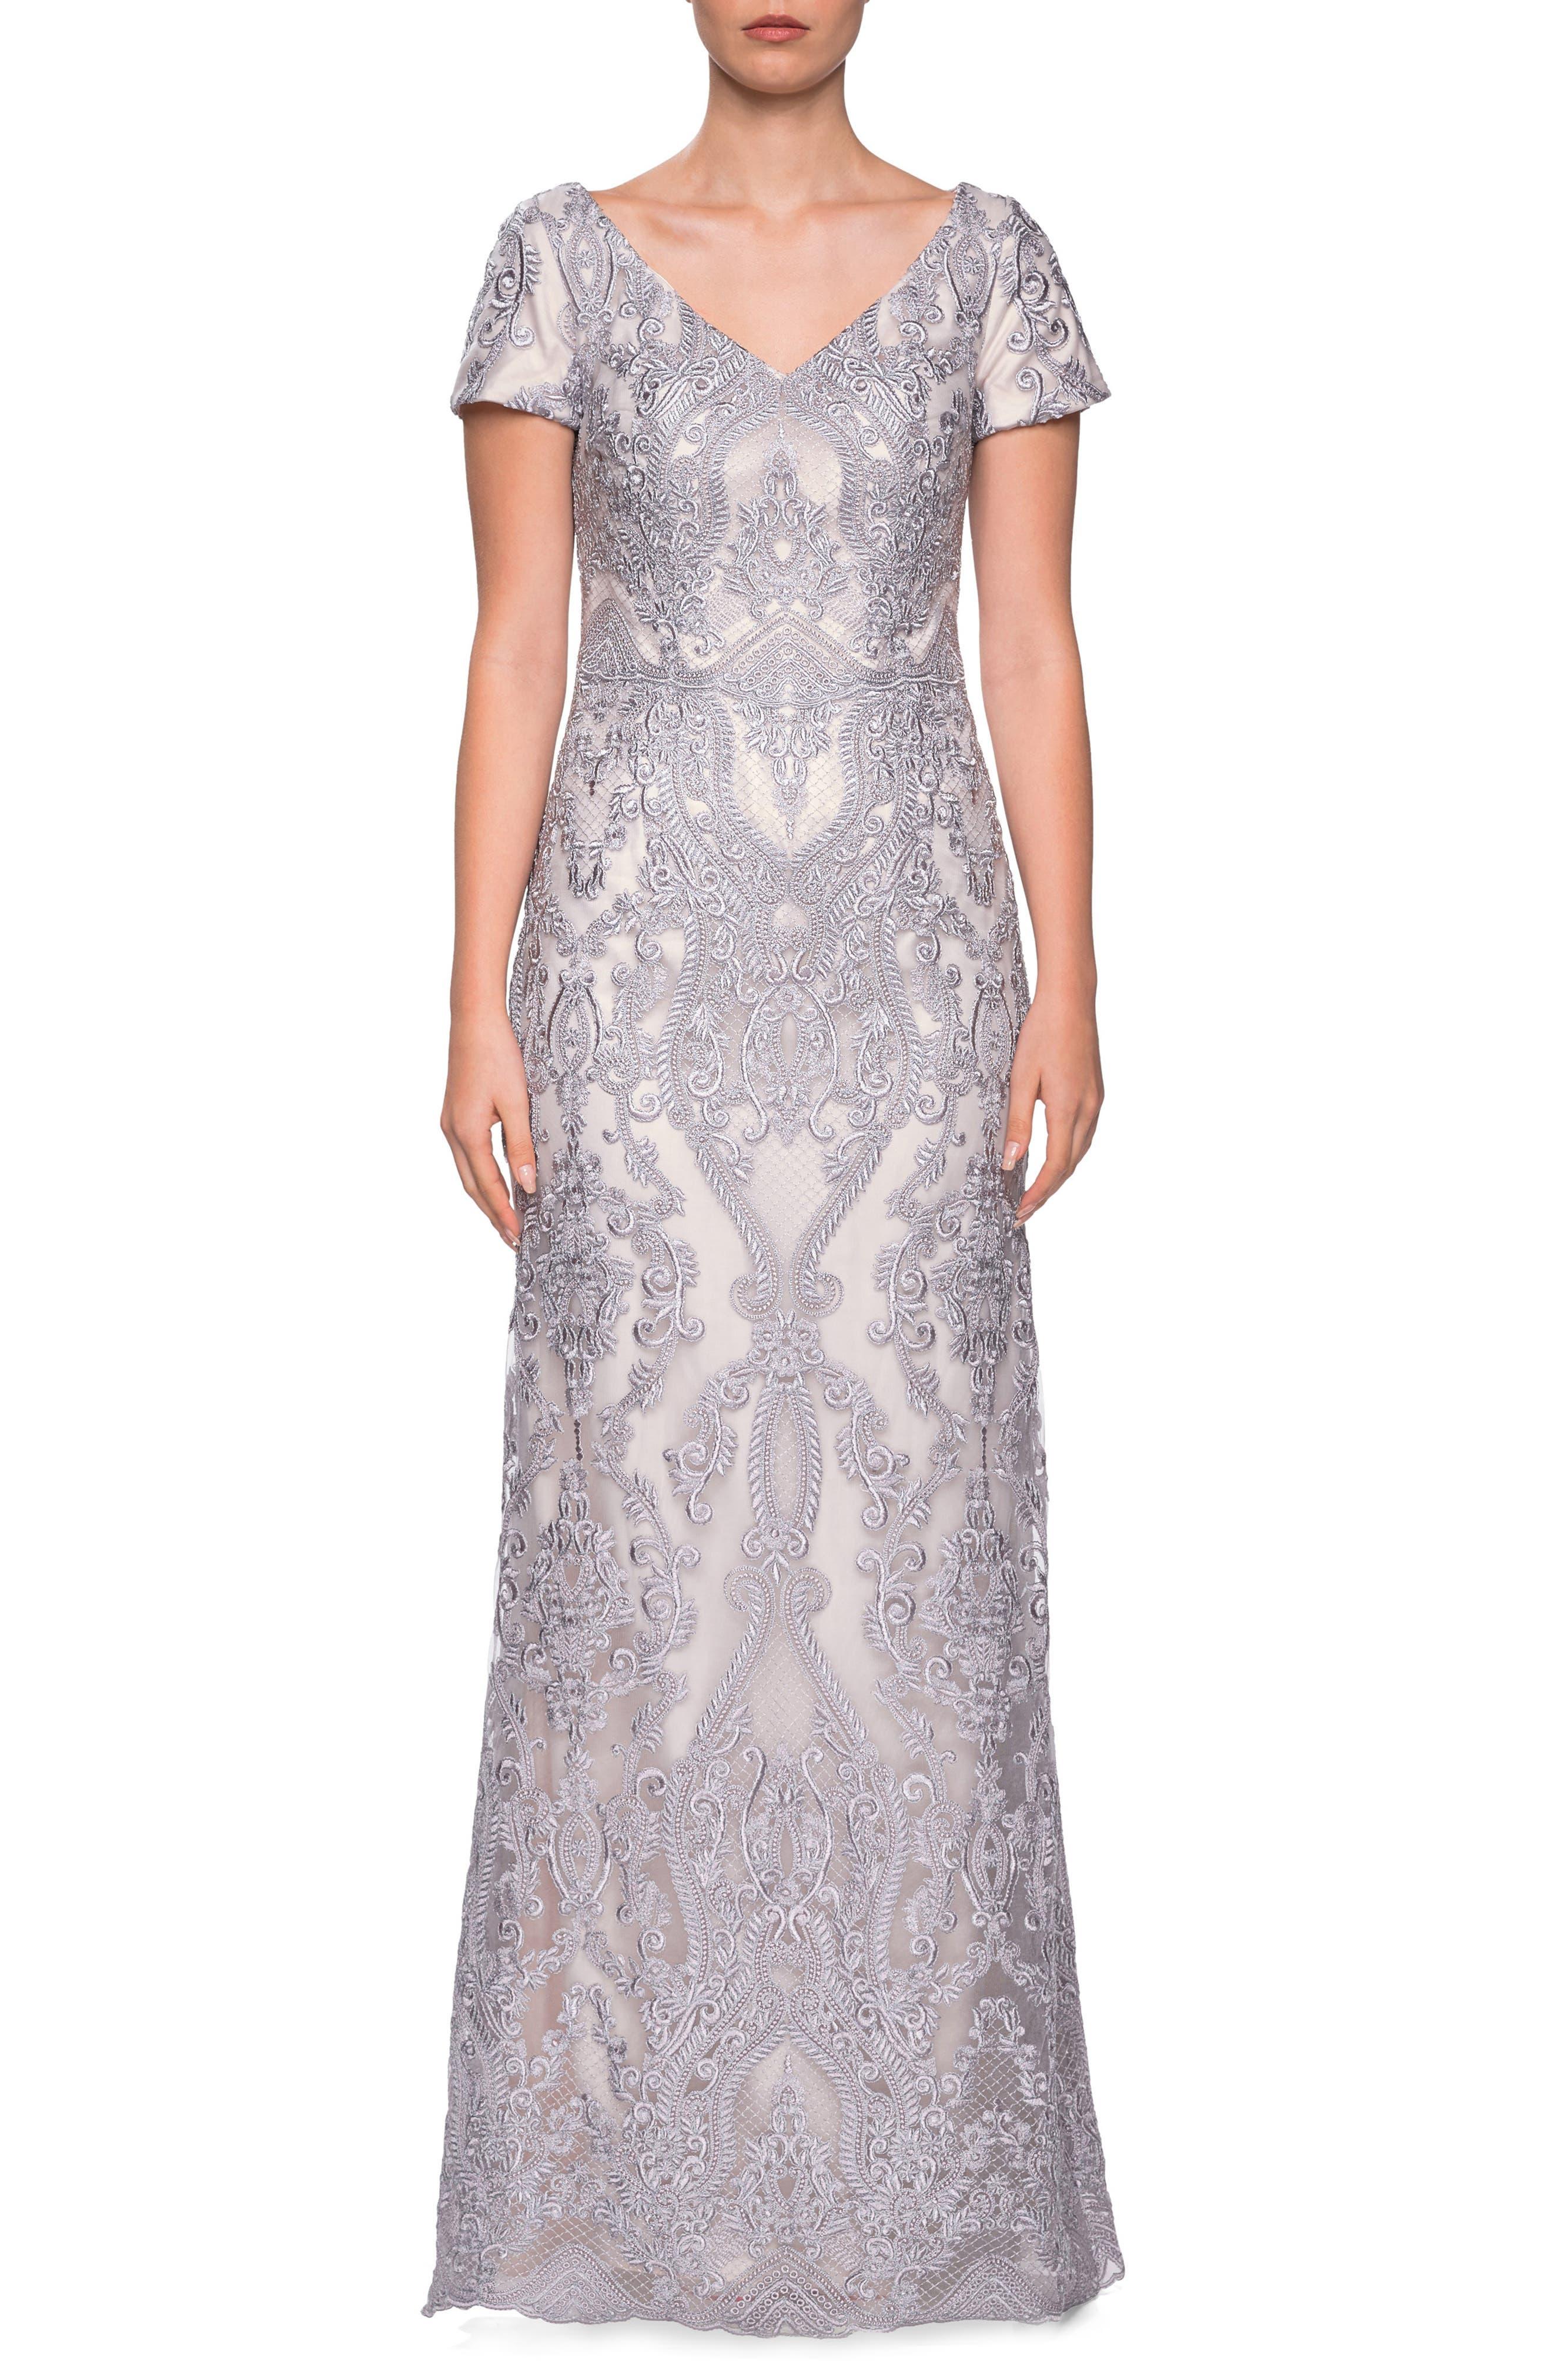 La Femme Embroidered Lace Column Dress, Grey